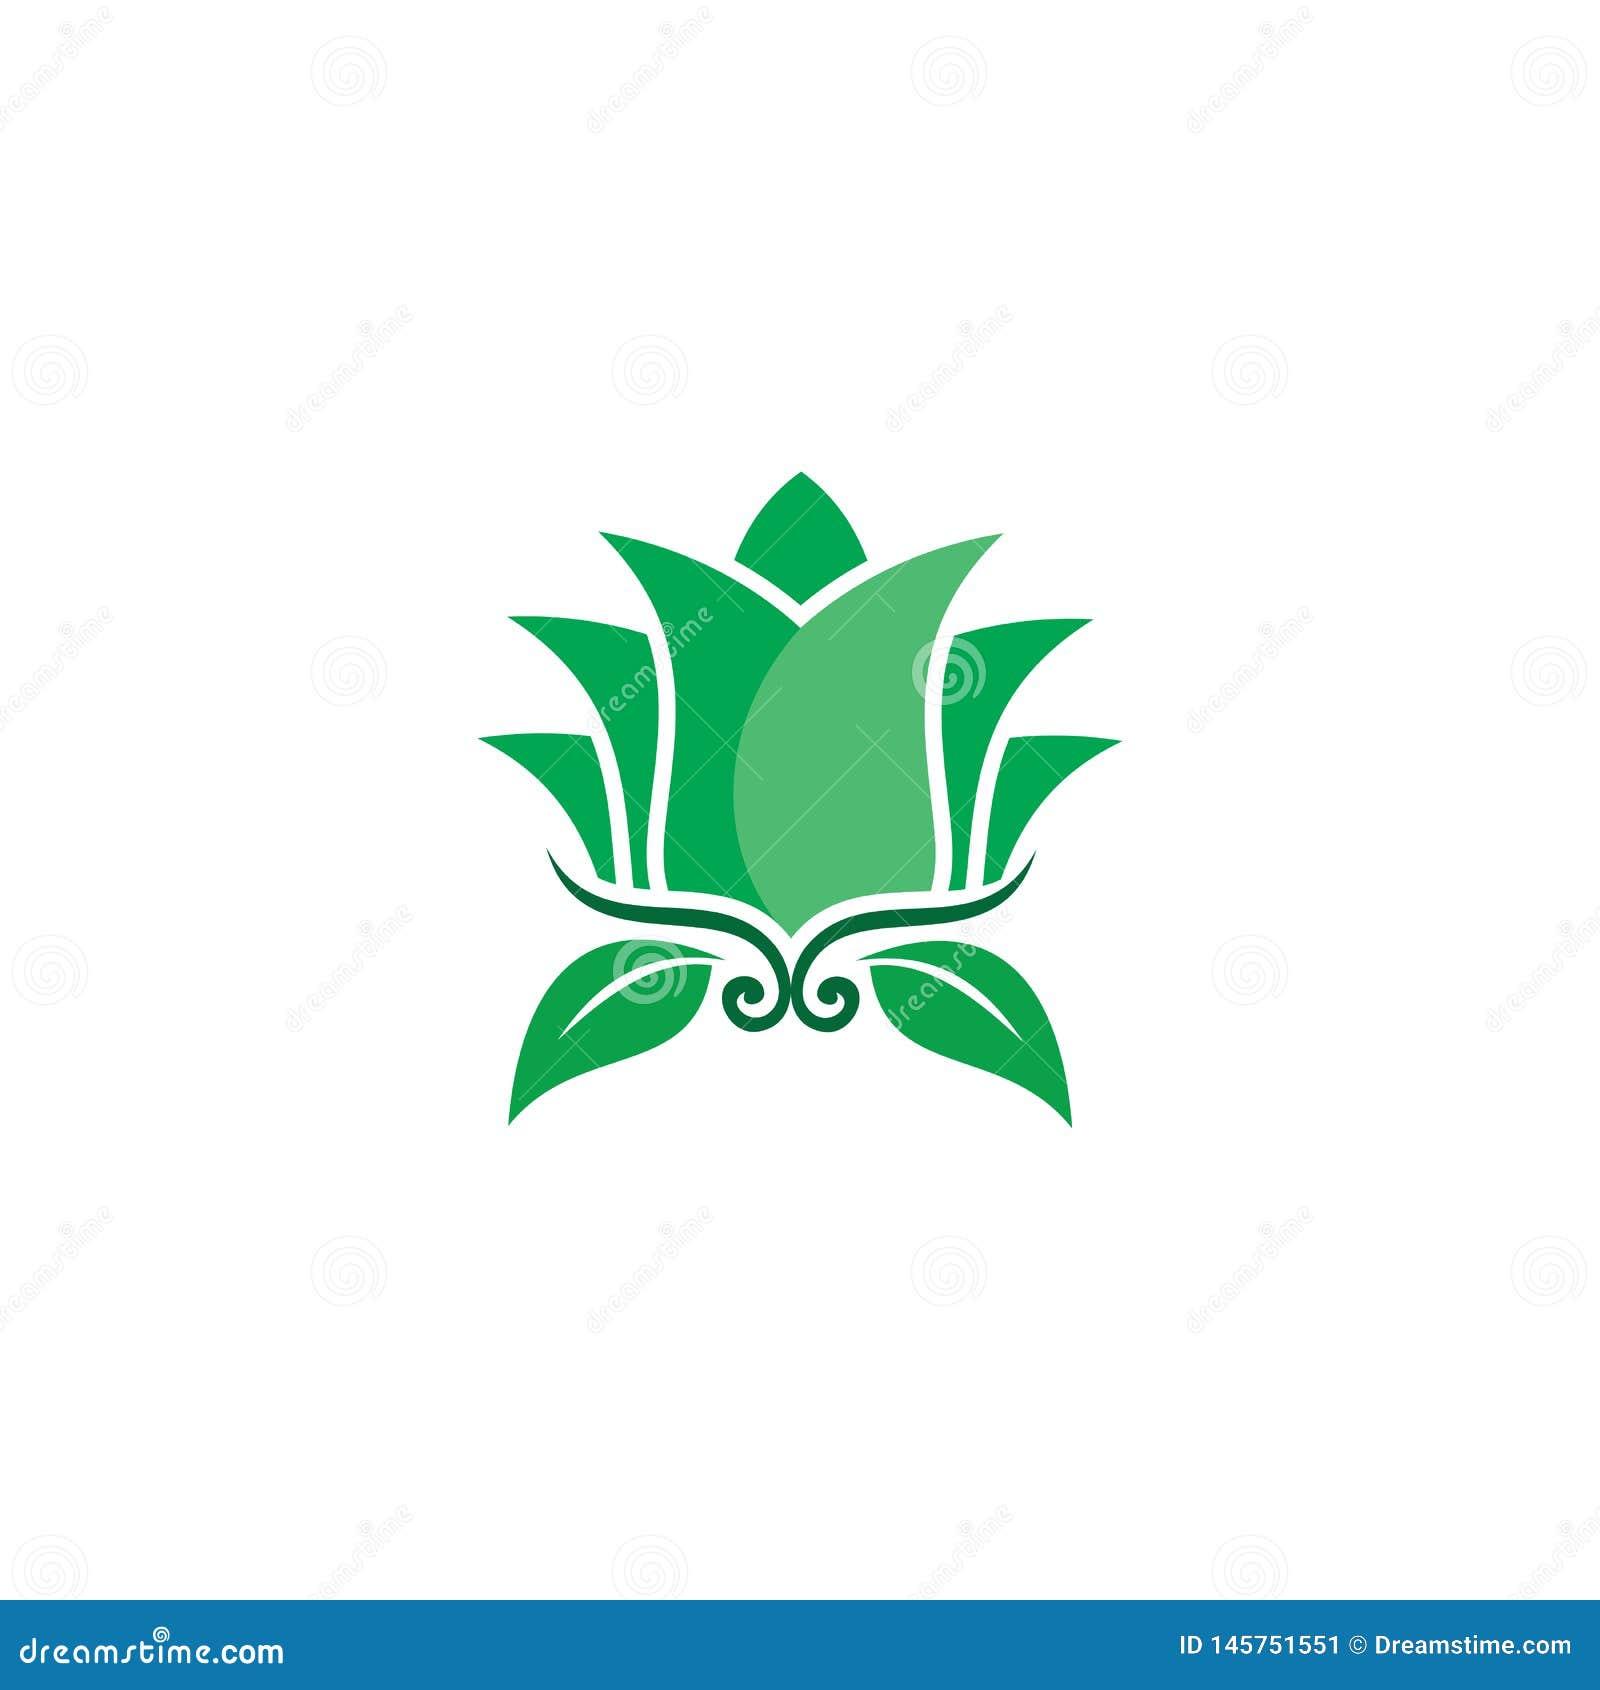 Lotus-embleem van de bloem het groene aard